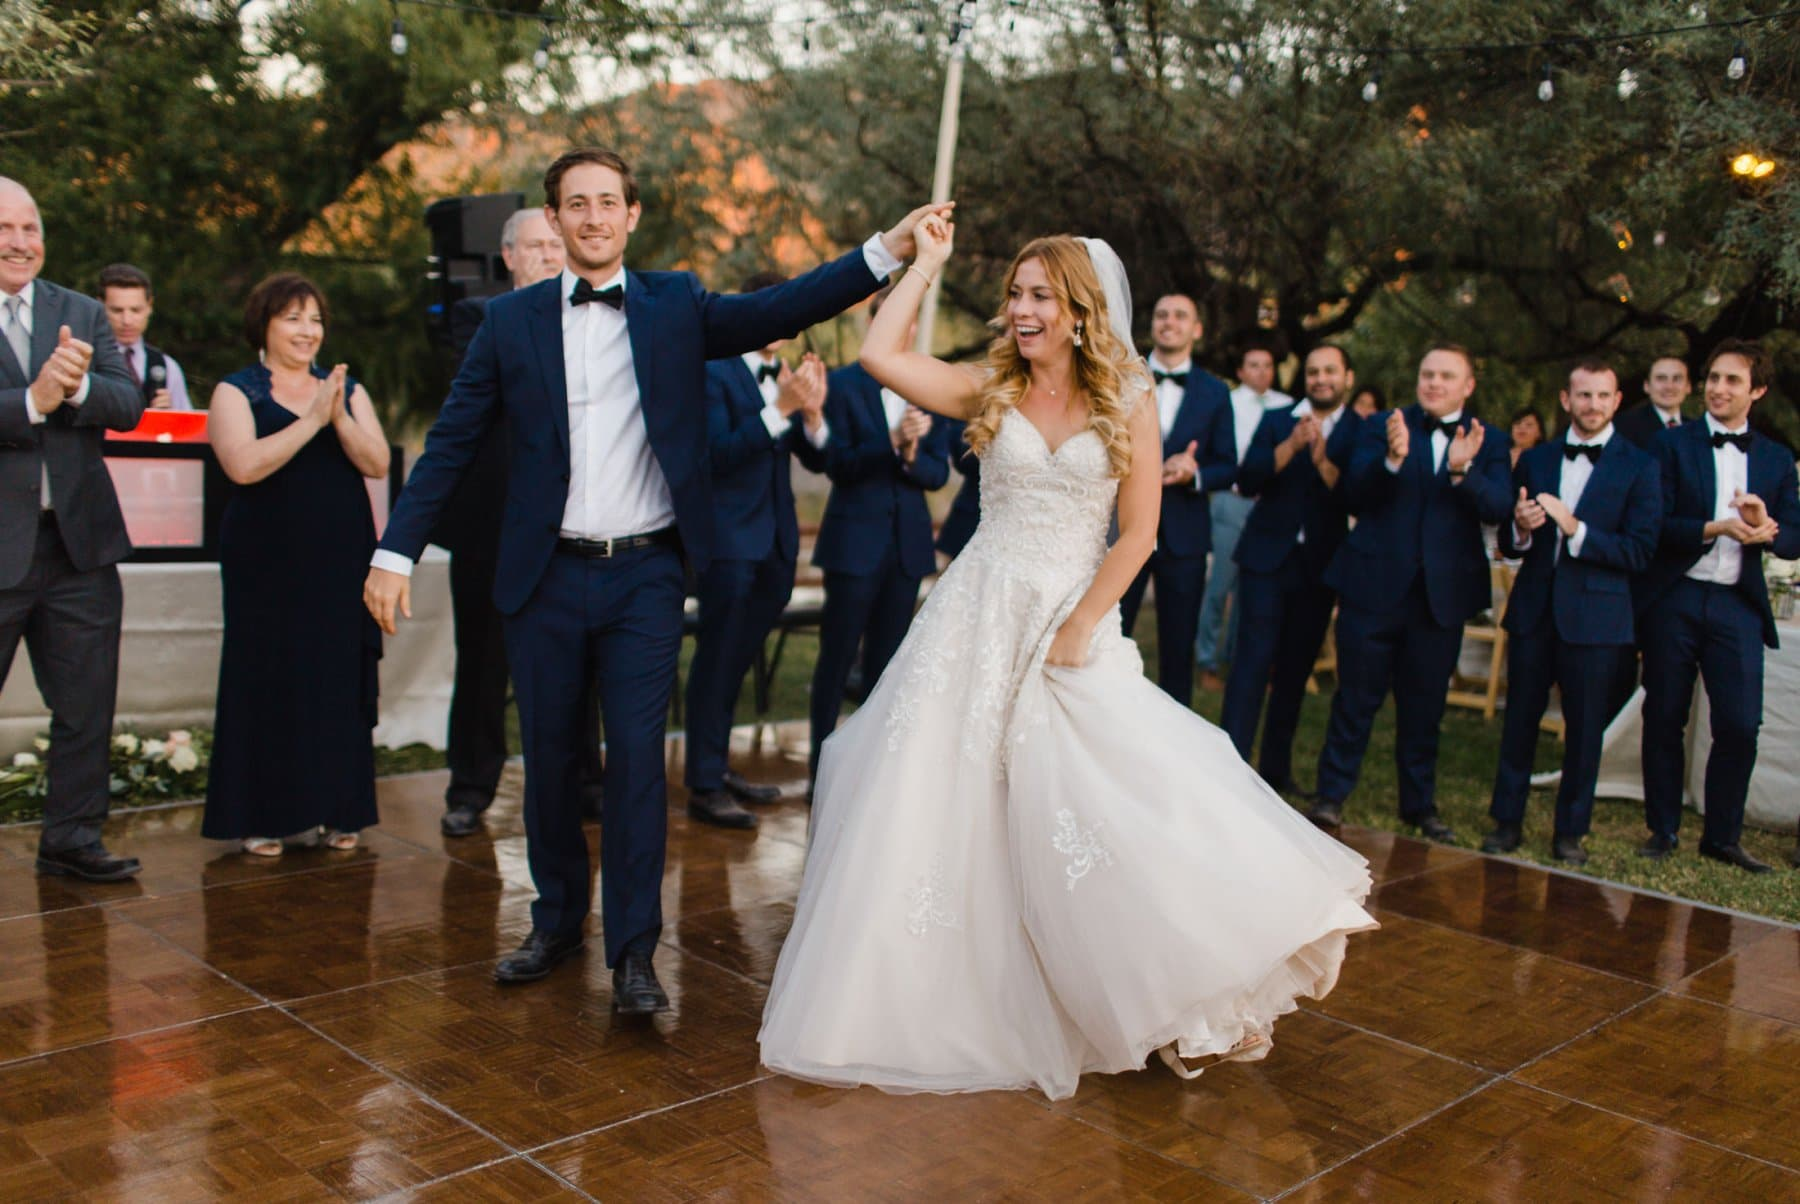 grand entrance bride & groom at Saguaro Lake Ranch wedding